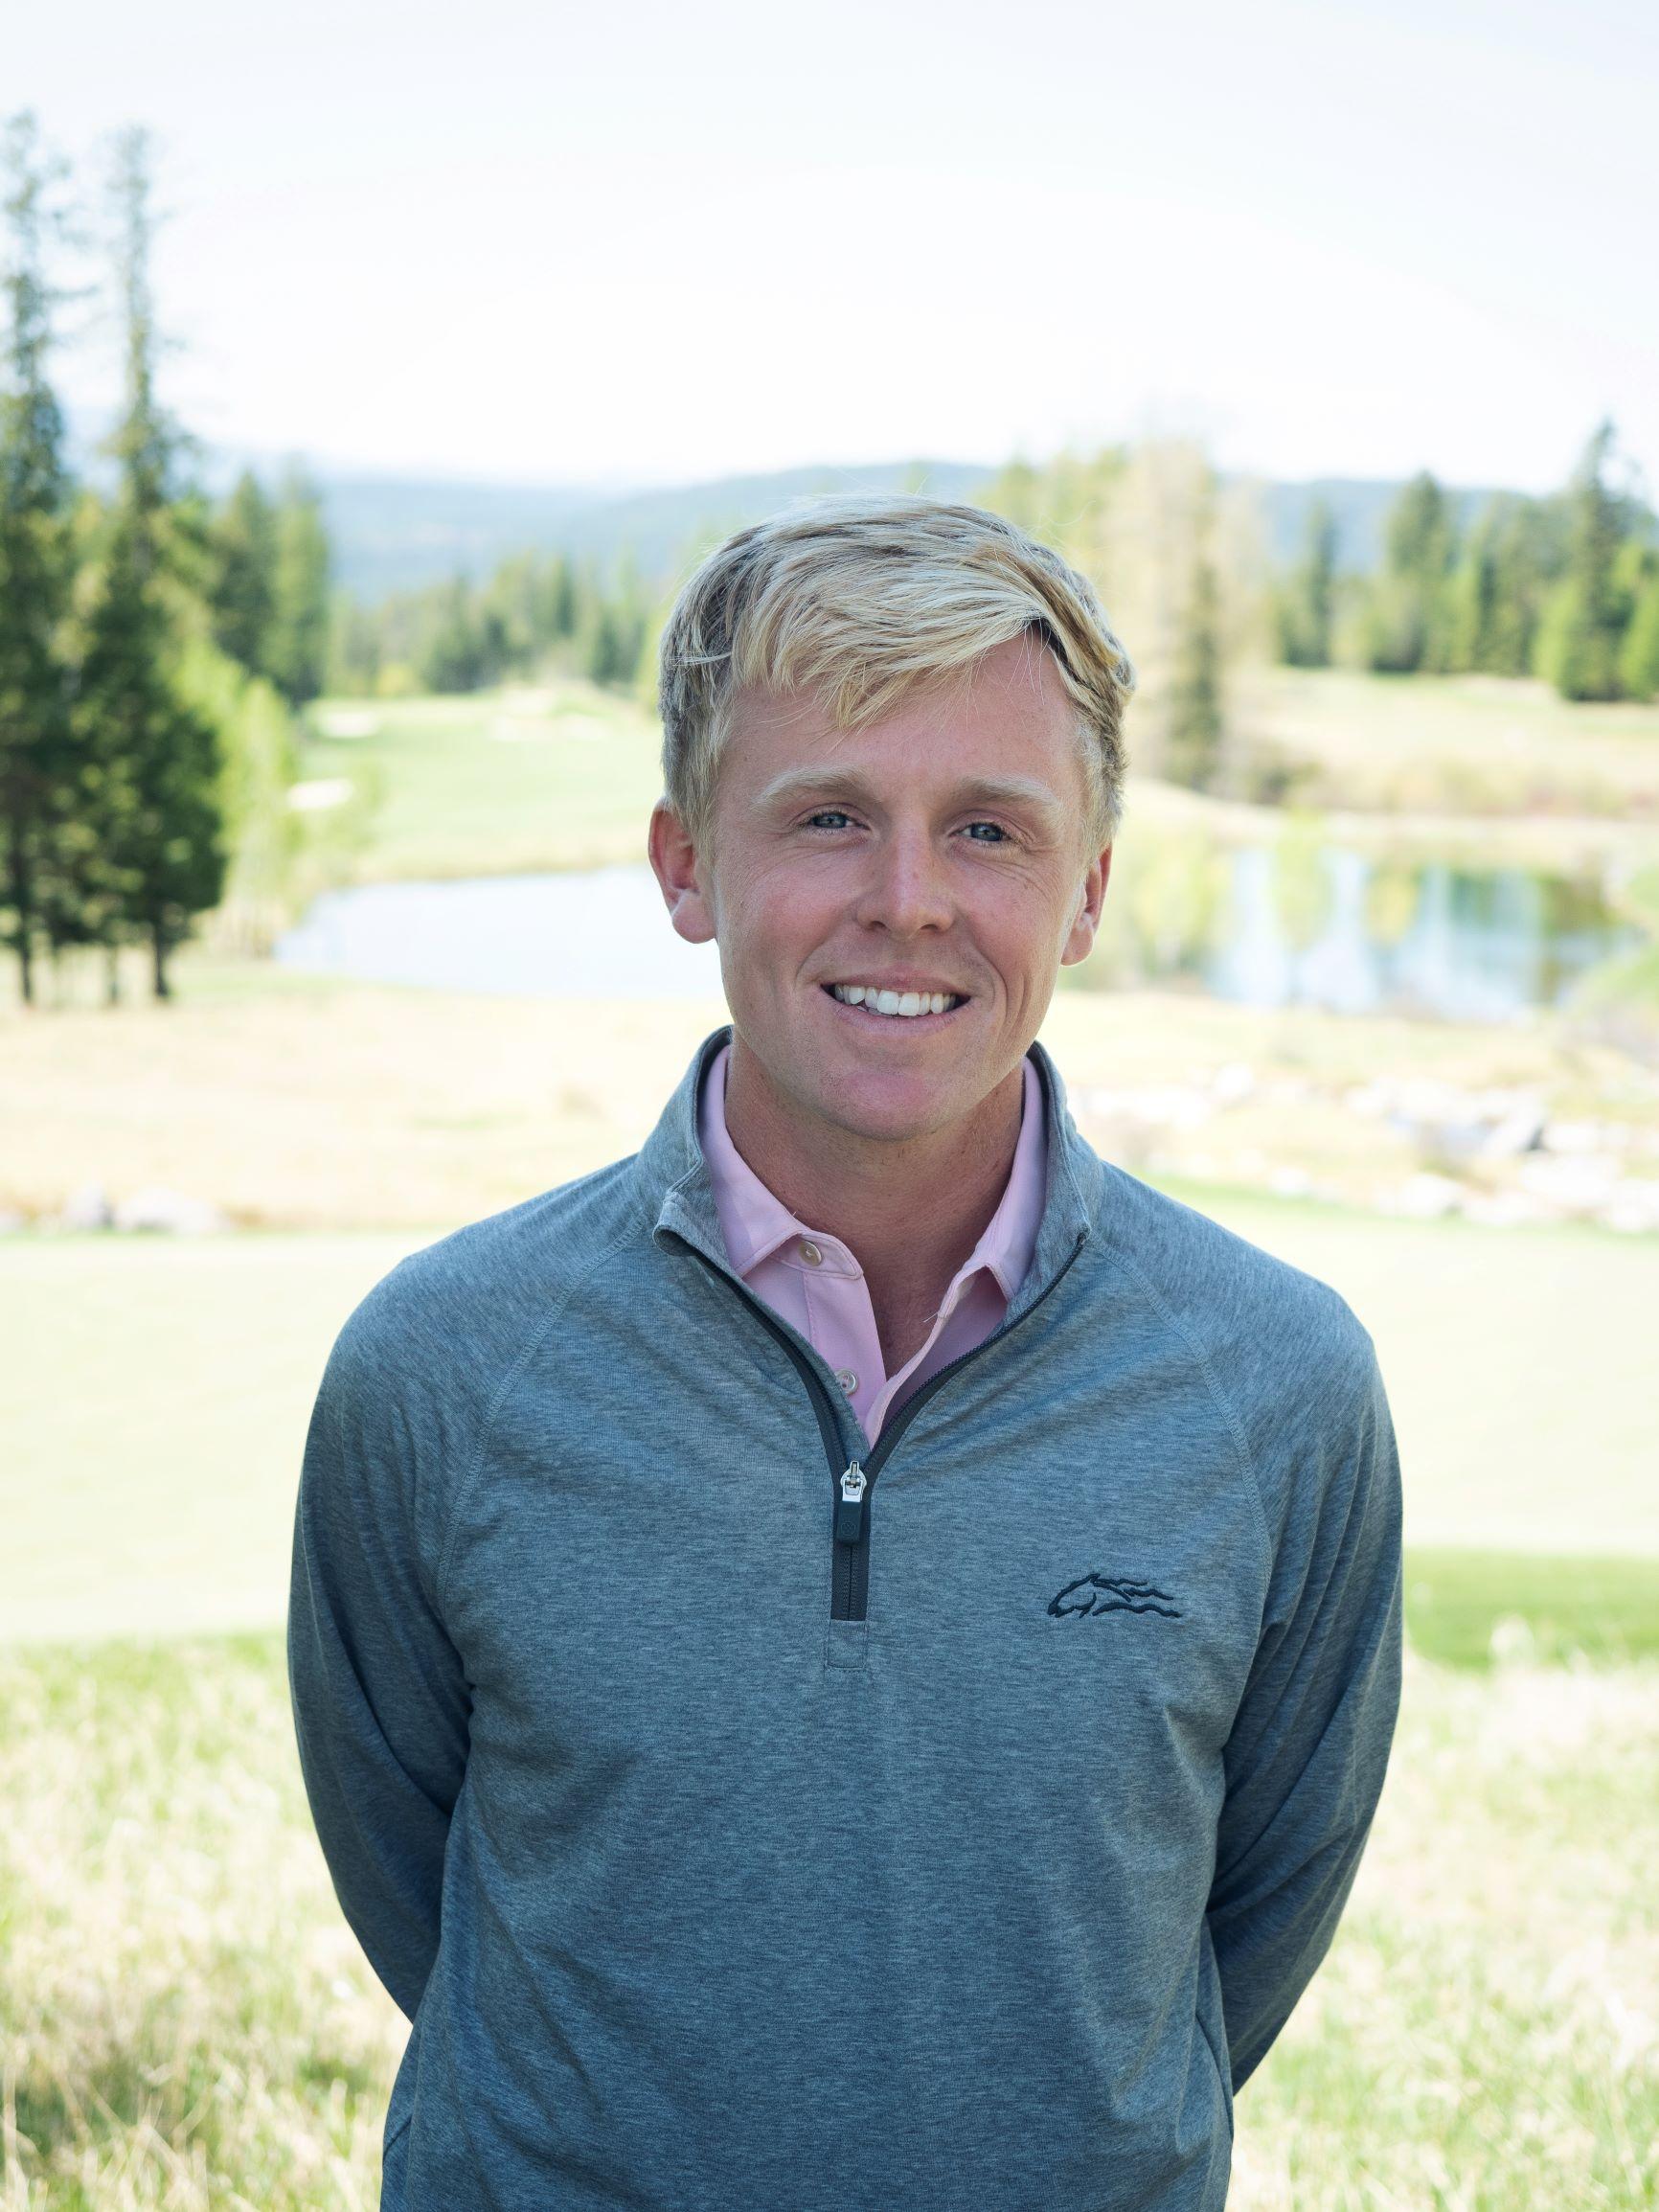 Ryan Oliver, PGA